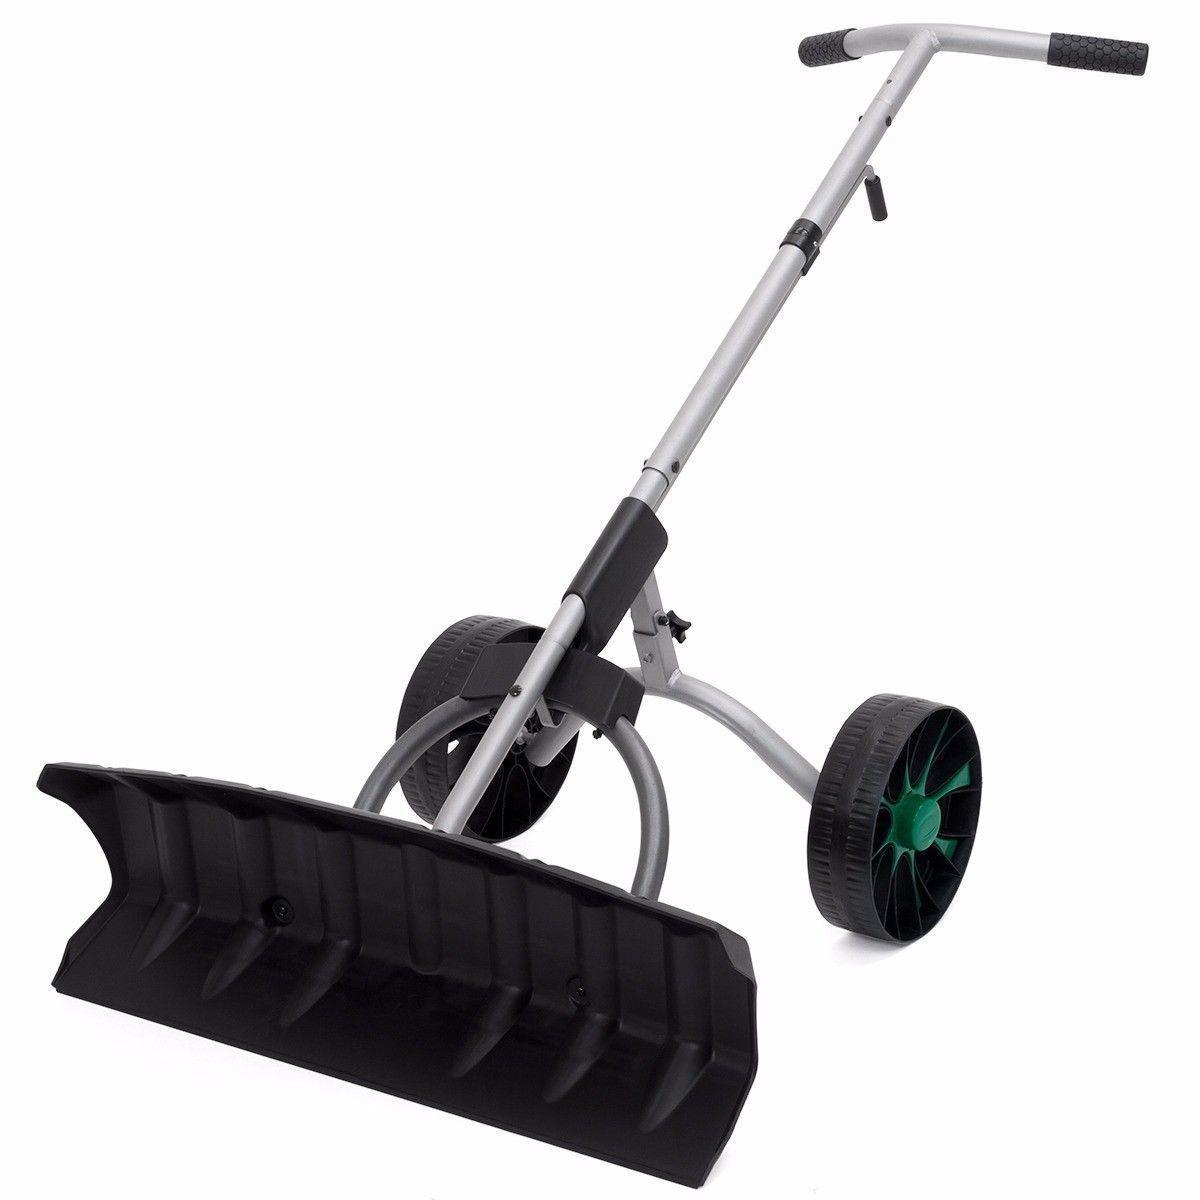 Snow Shovel Driveway Removal Blade Wheels Plow Adjustable Pusher Walk Behind